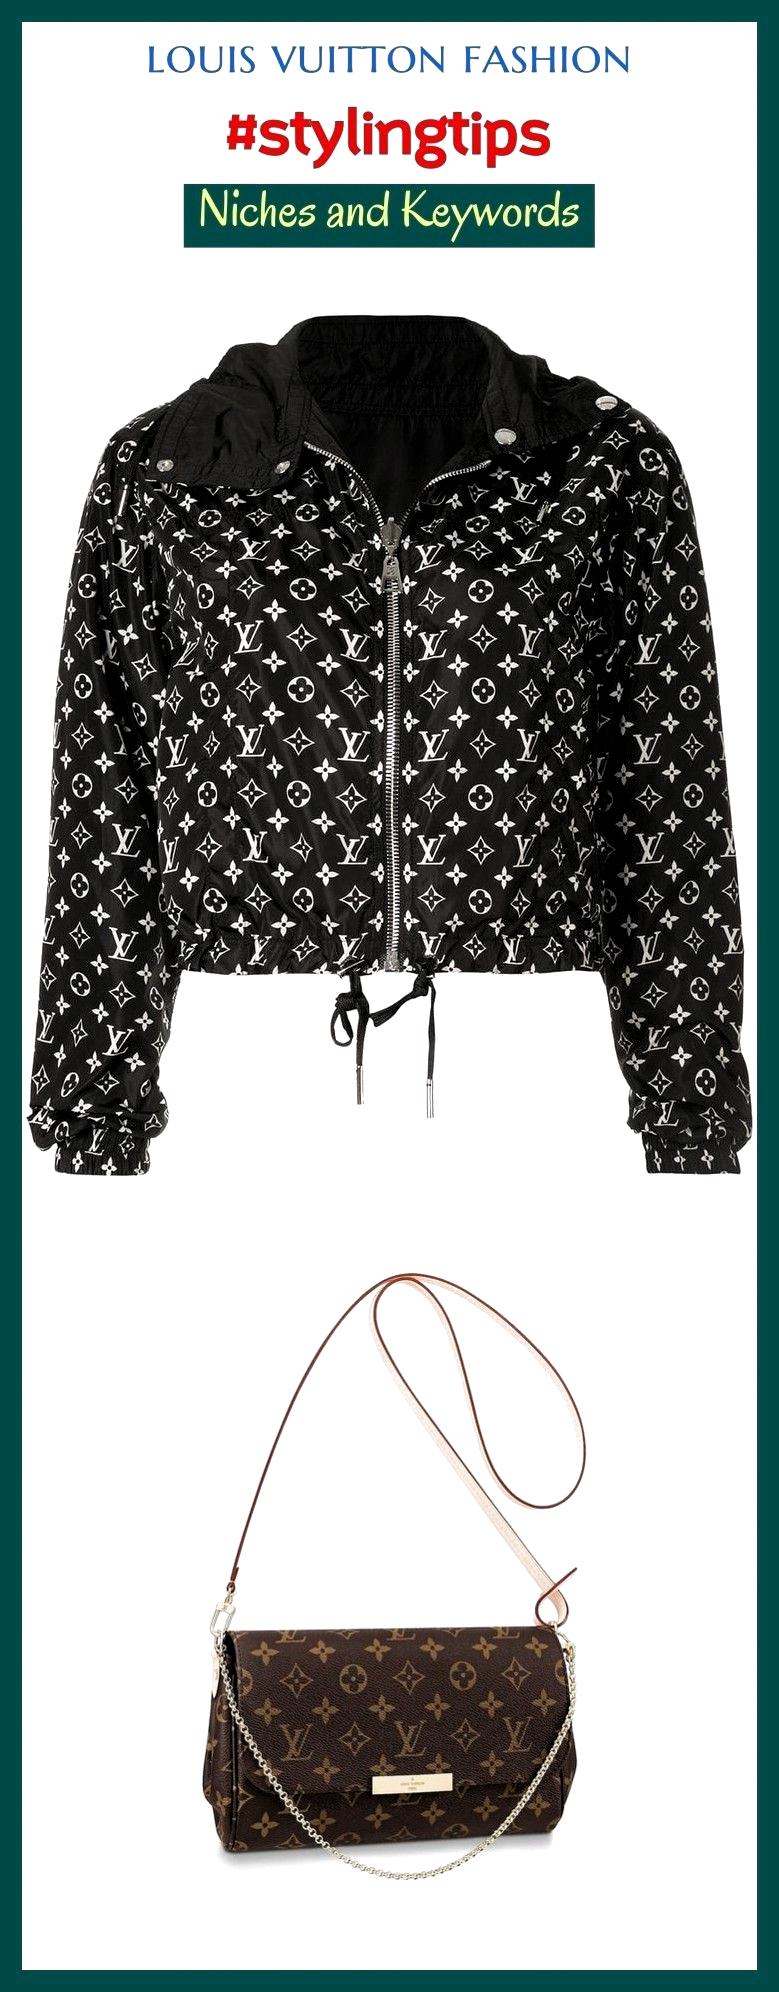 Louis vuitton fashion . louis vuitton handbags, louis vuitton shoes, louis vuitton wallpaper, louis vuitton